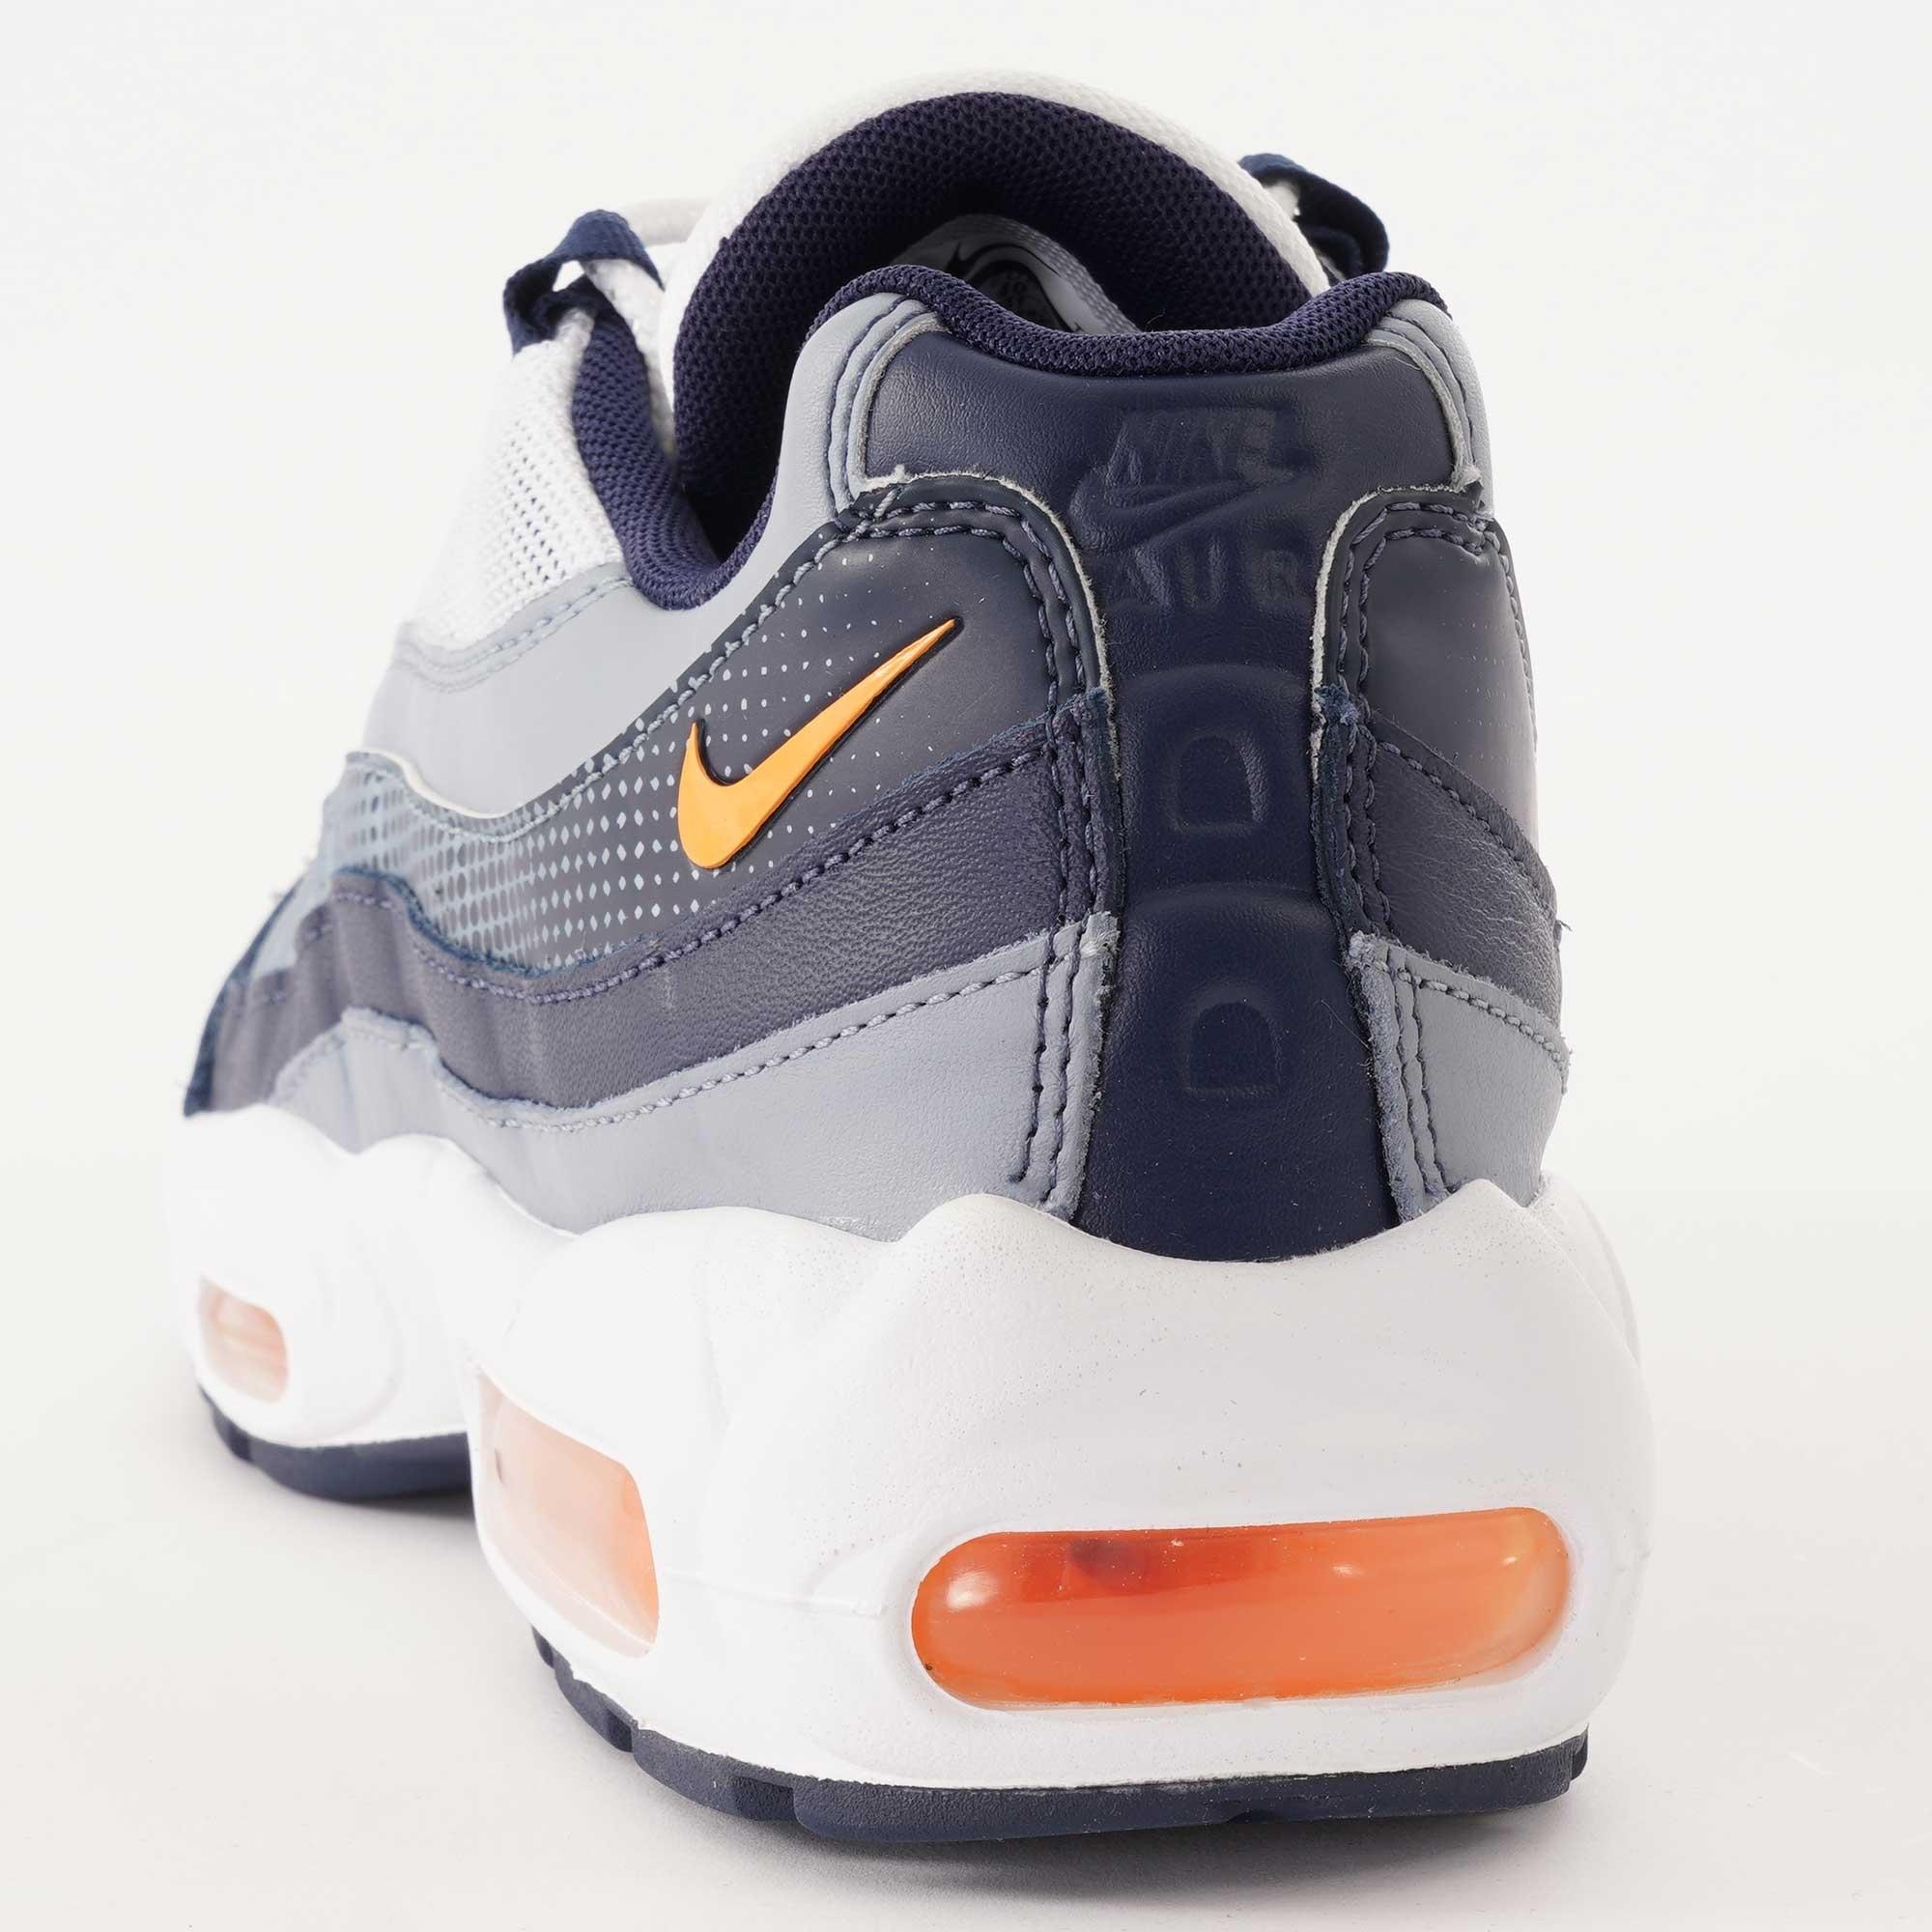 air max 95 navy blue and orange